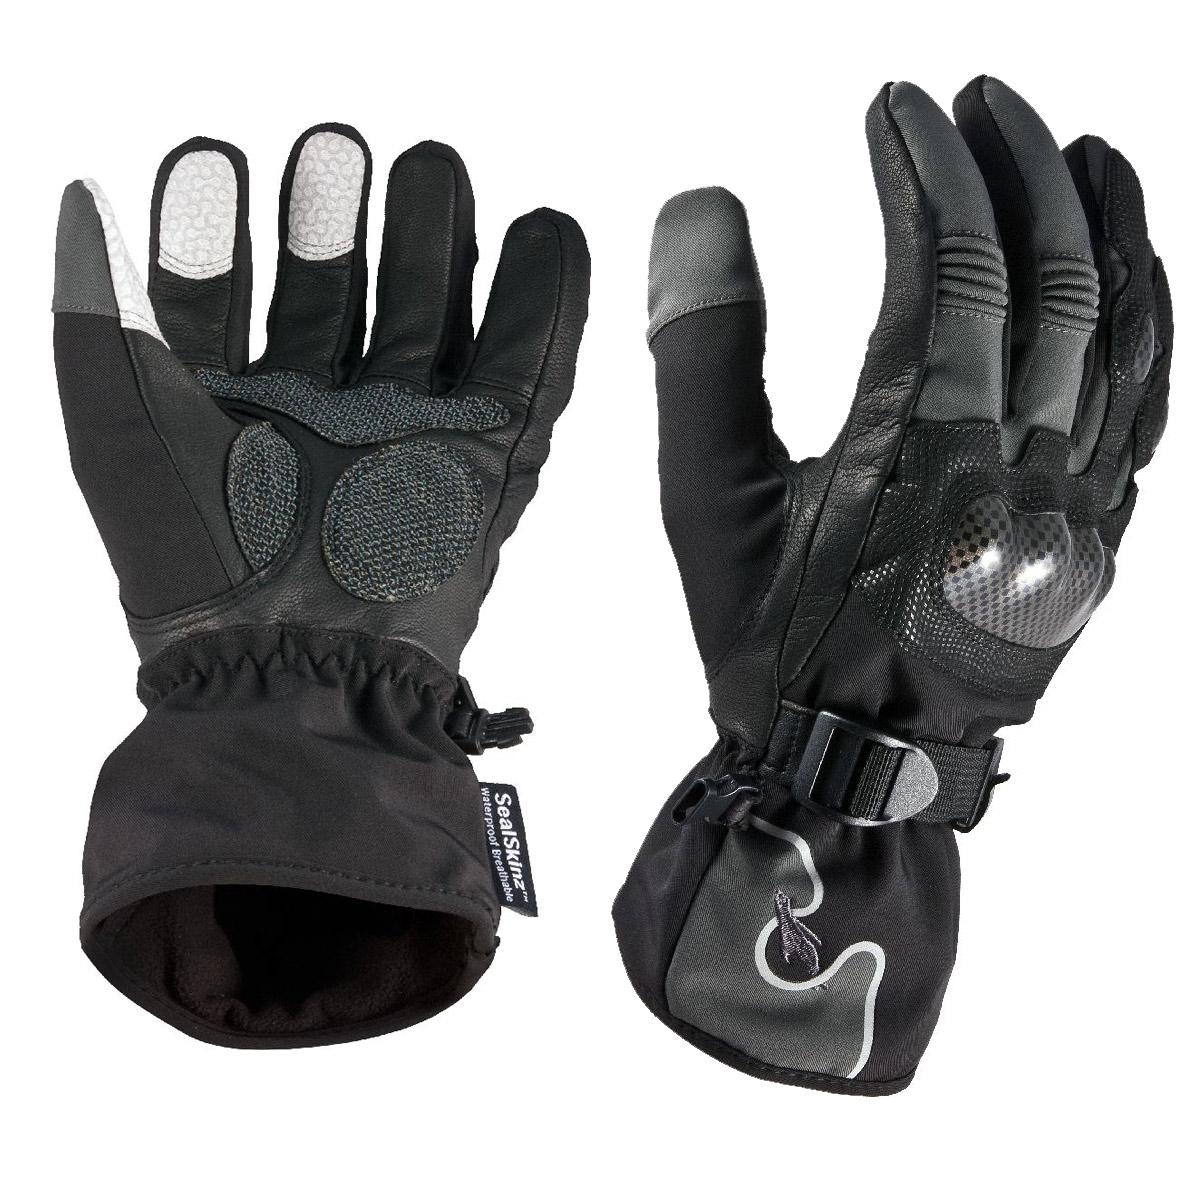 Motorcycle gloves large - Image Of Sealskinz Motorcycle Gloves Black Grey